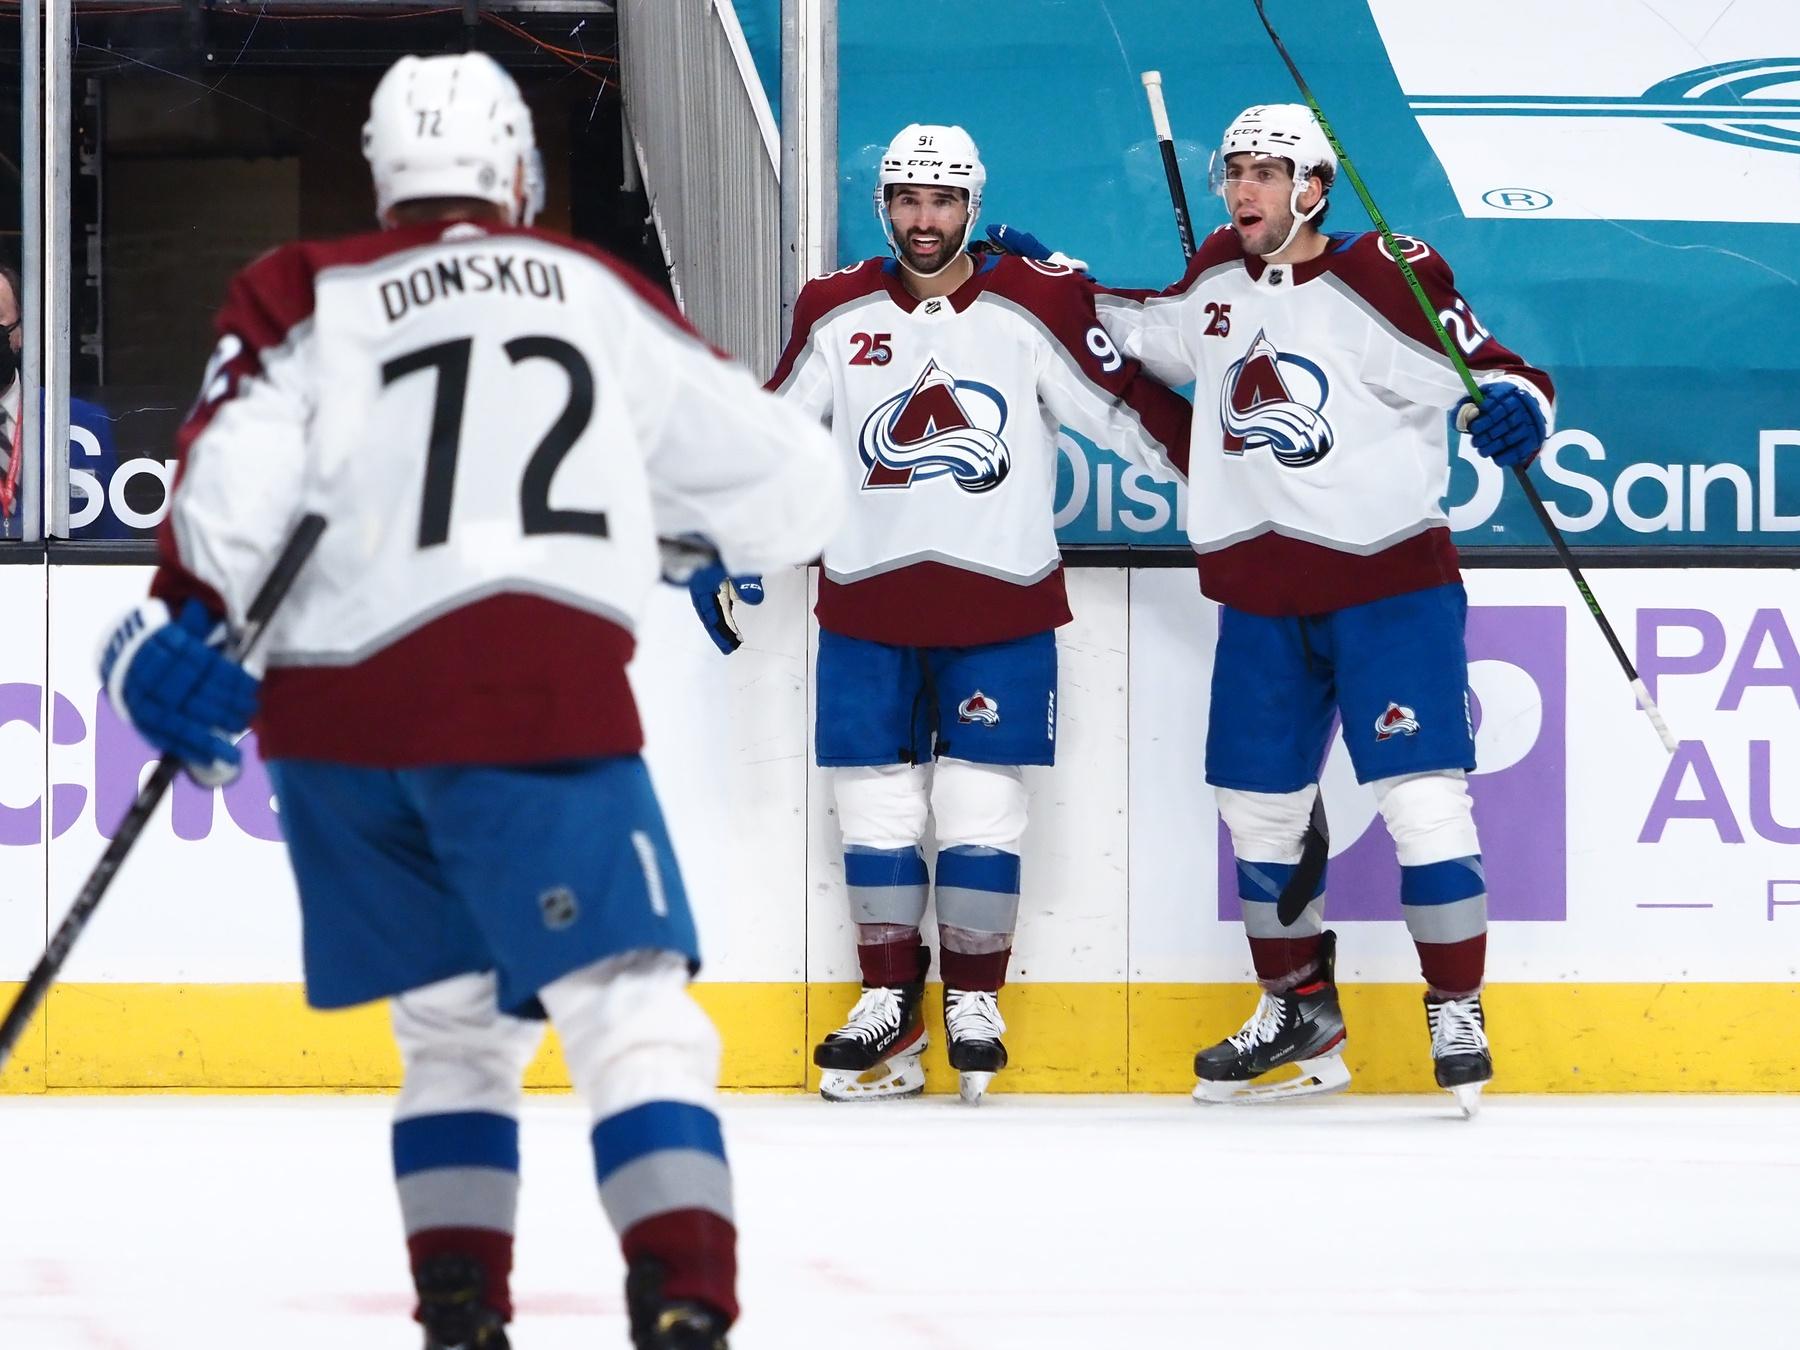 avalanche kings betting pick prediction may 8